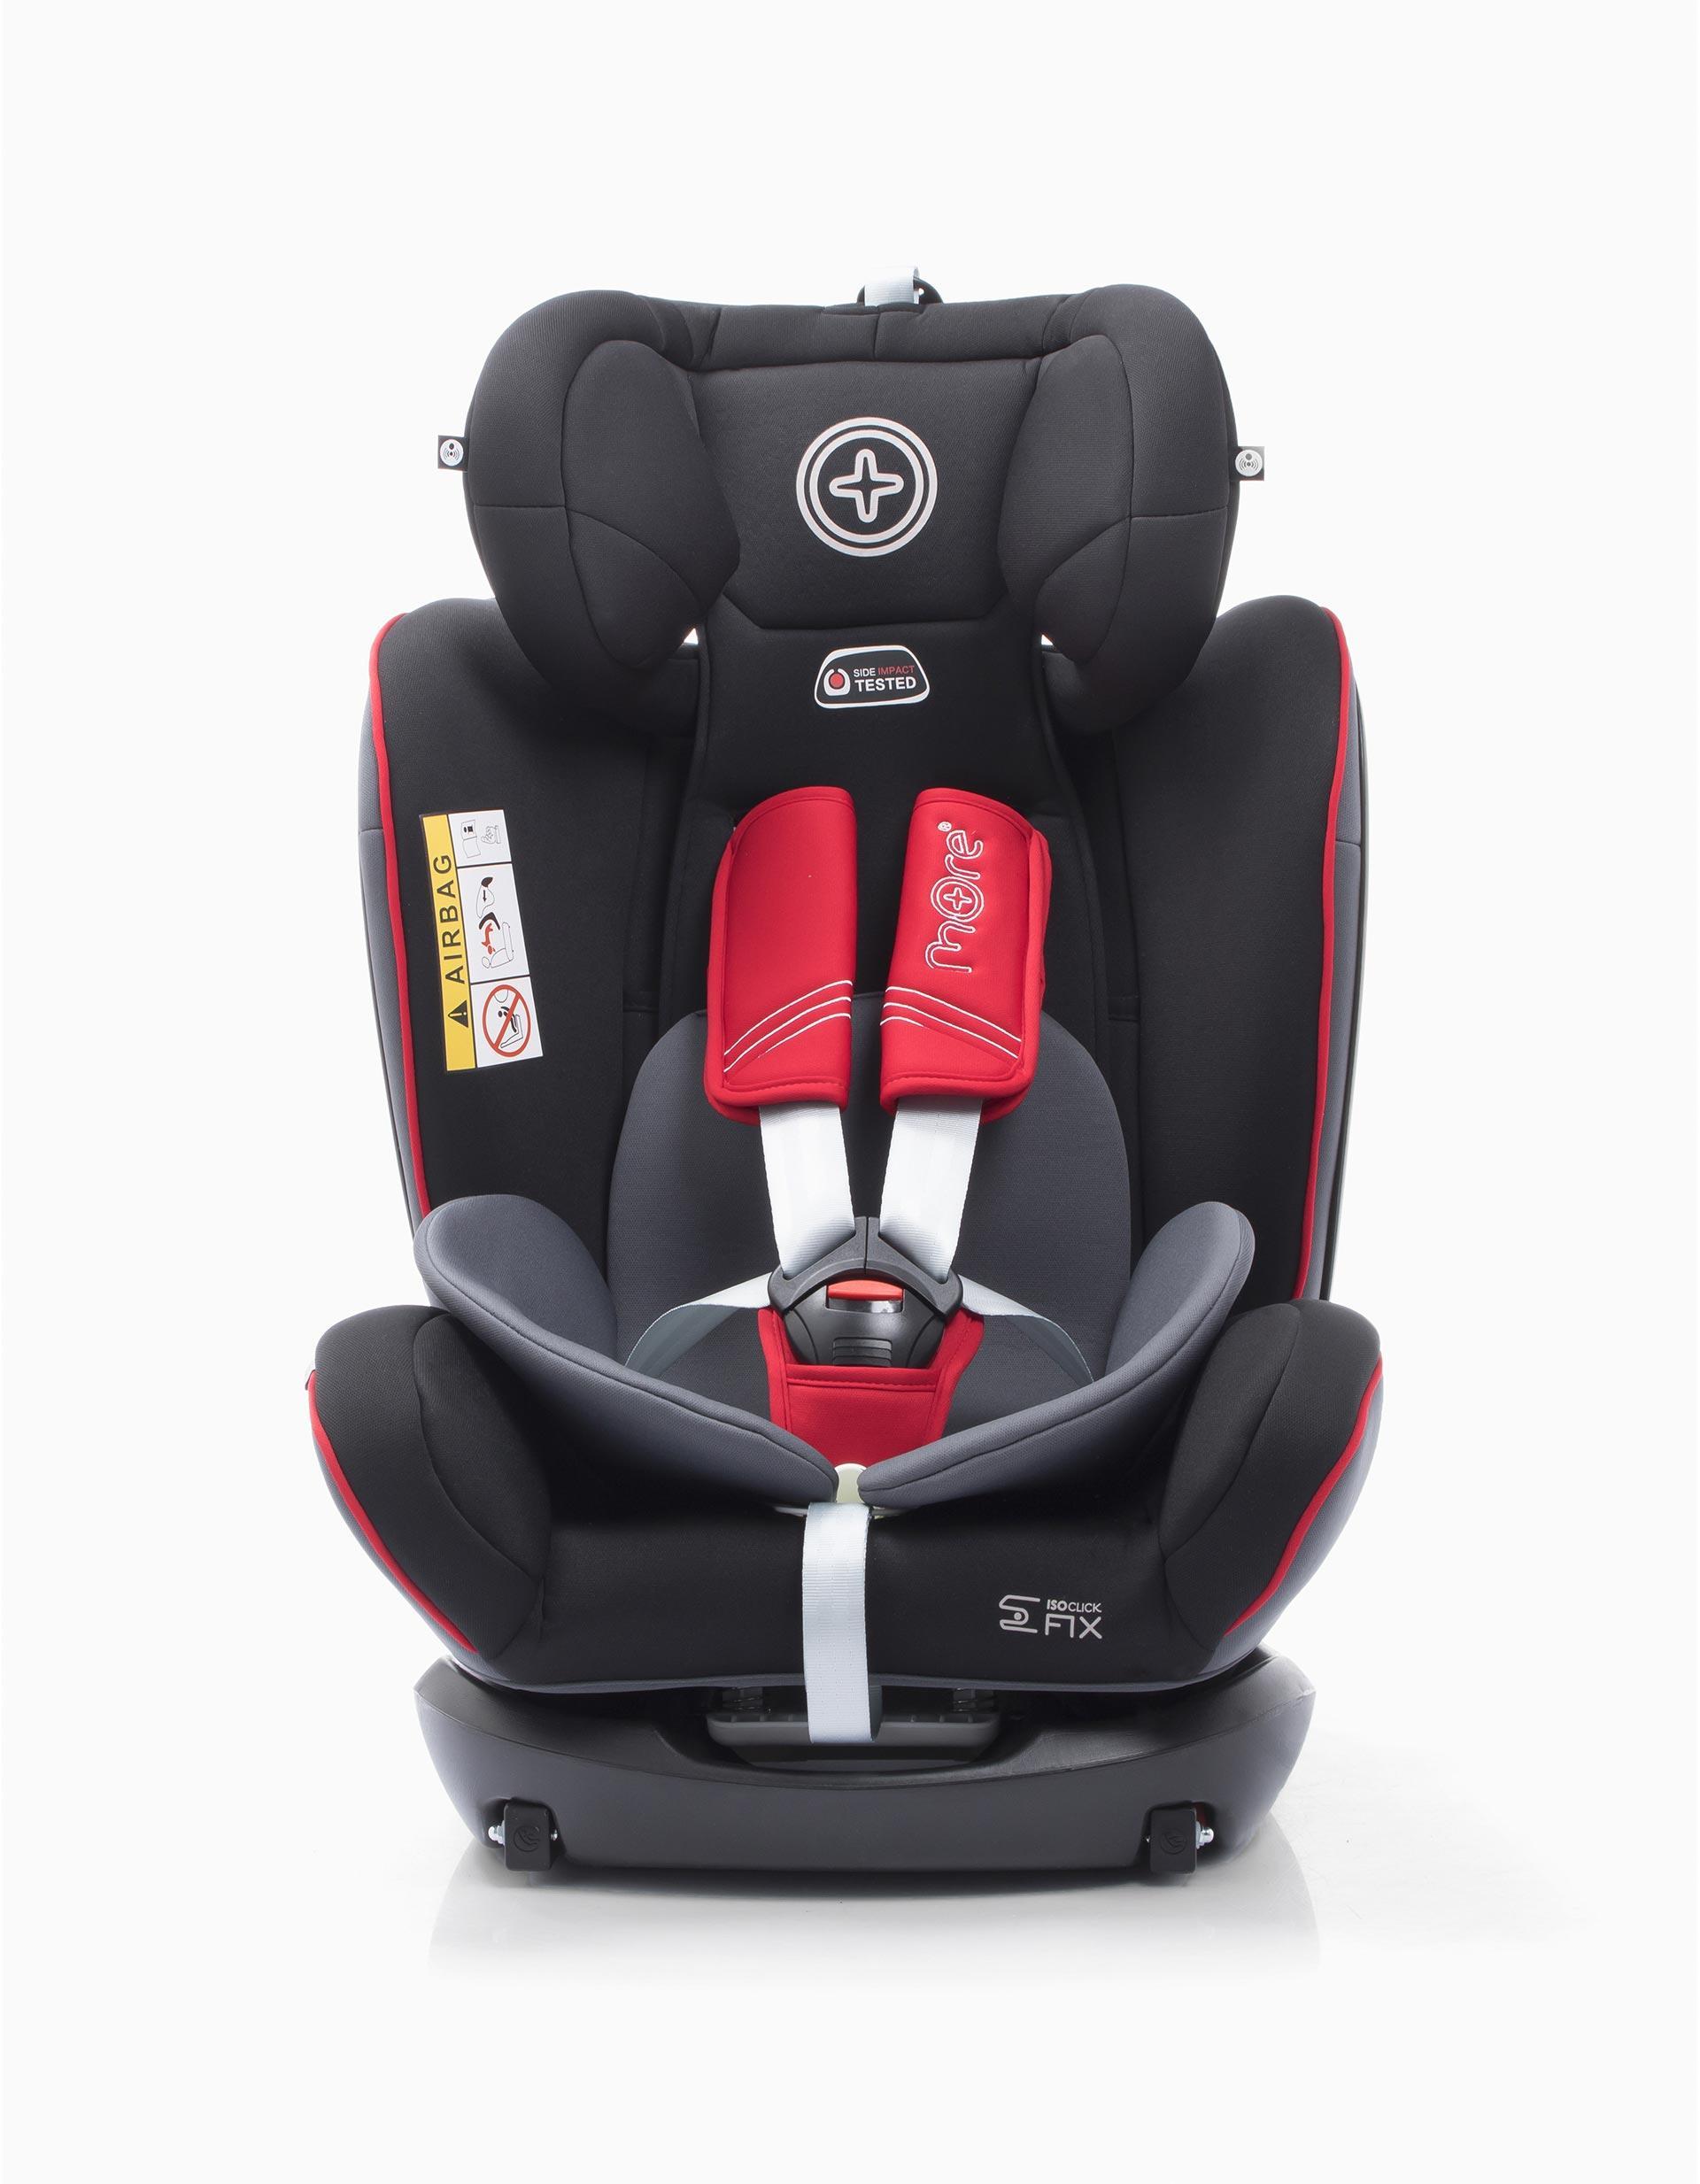 Autositz Kinder Babyauto 8436015311718 Erfahrung